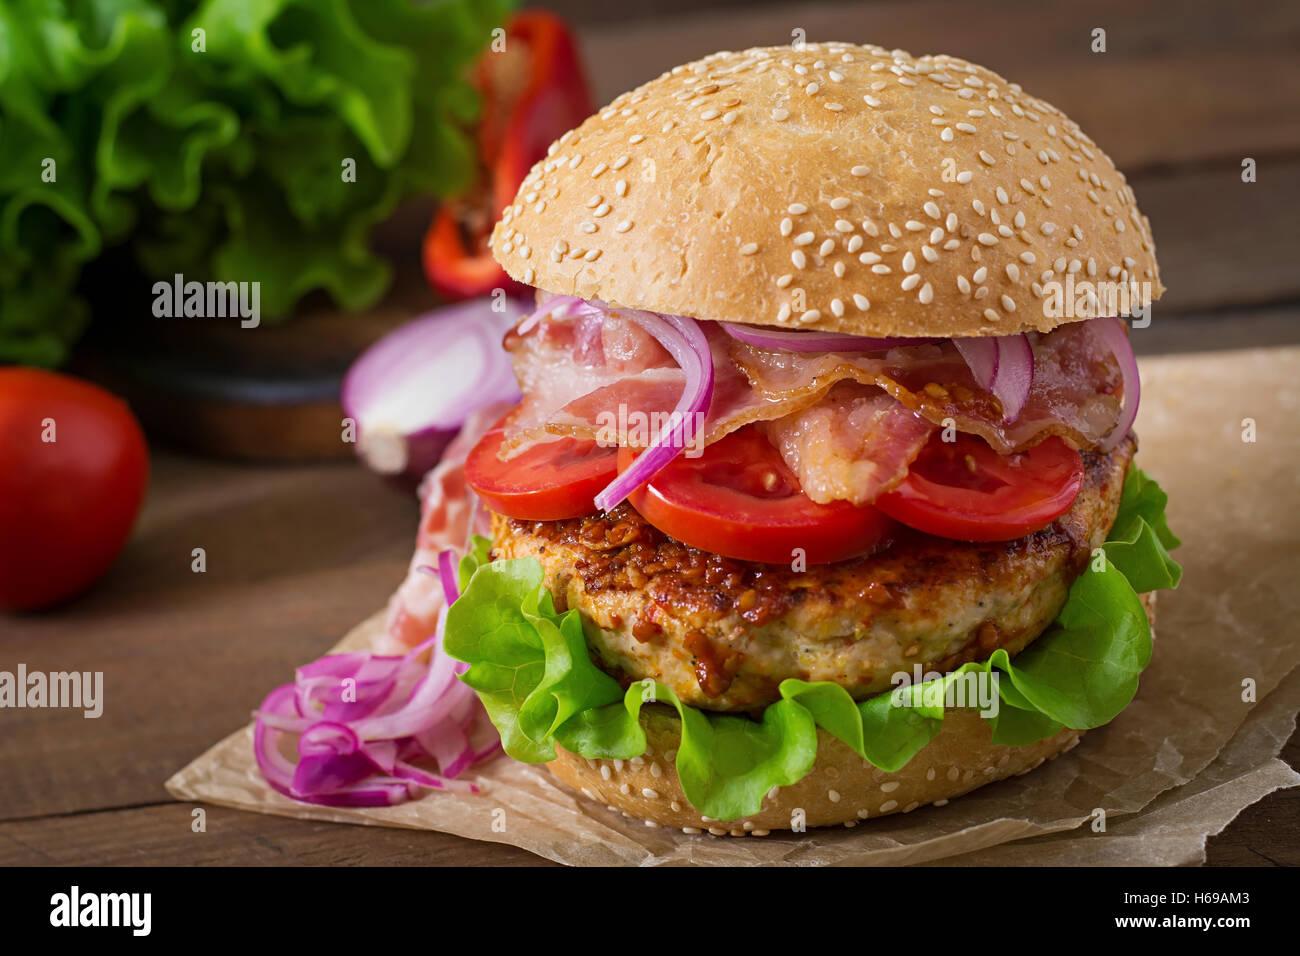 Big sandwich - hamburger burger de boeuf, oignons rouges, tomates et bacon frit. Photo Stock